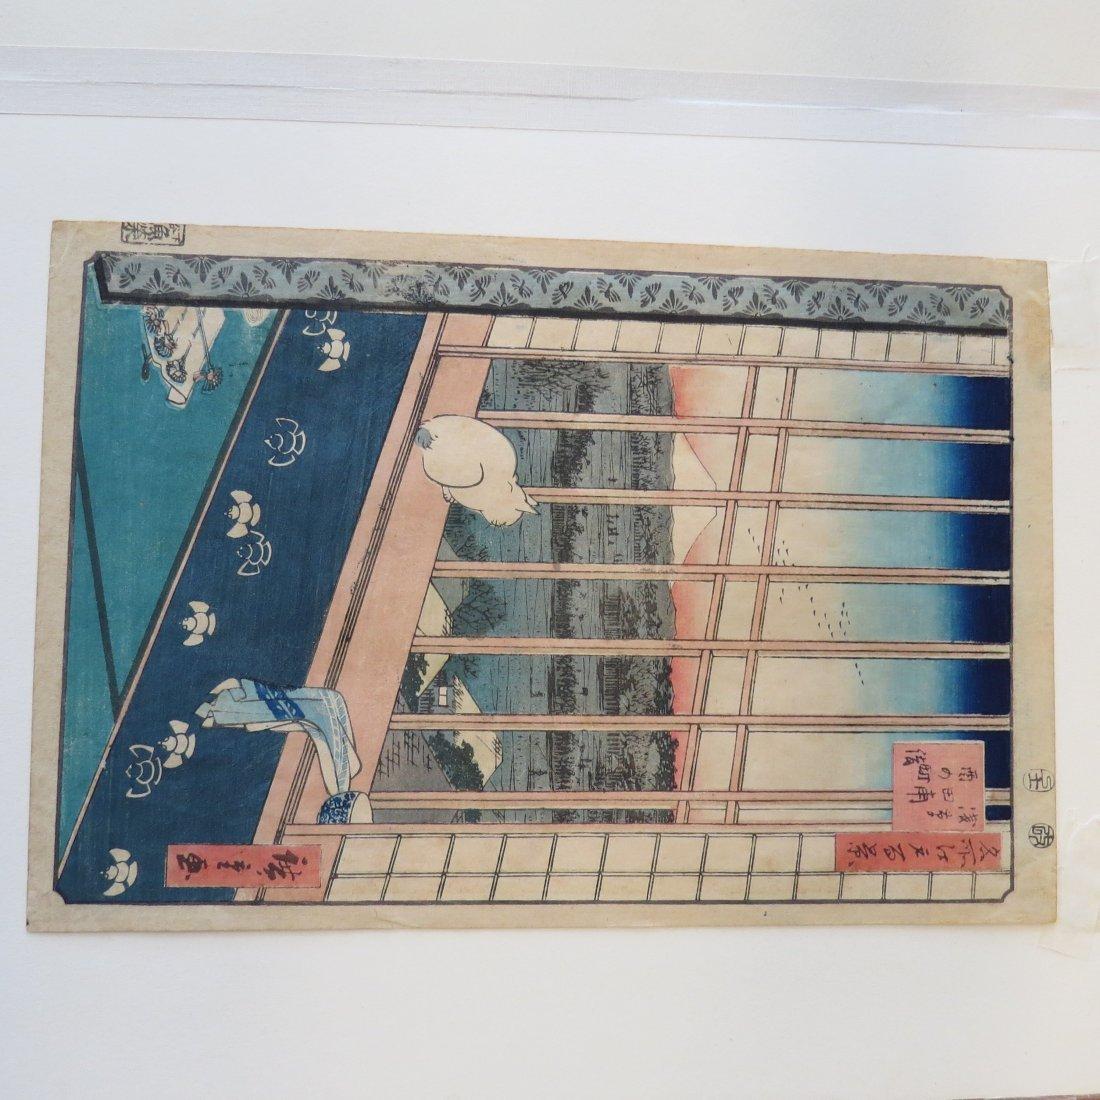 Hiroshige (Japanese, 1797-1858) Five Color Woodcuts. - 2